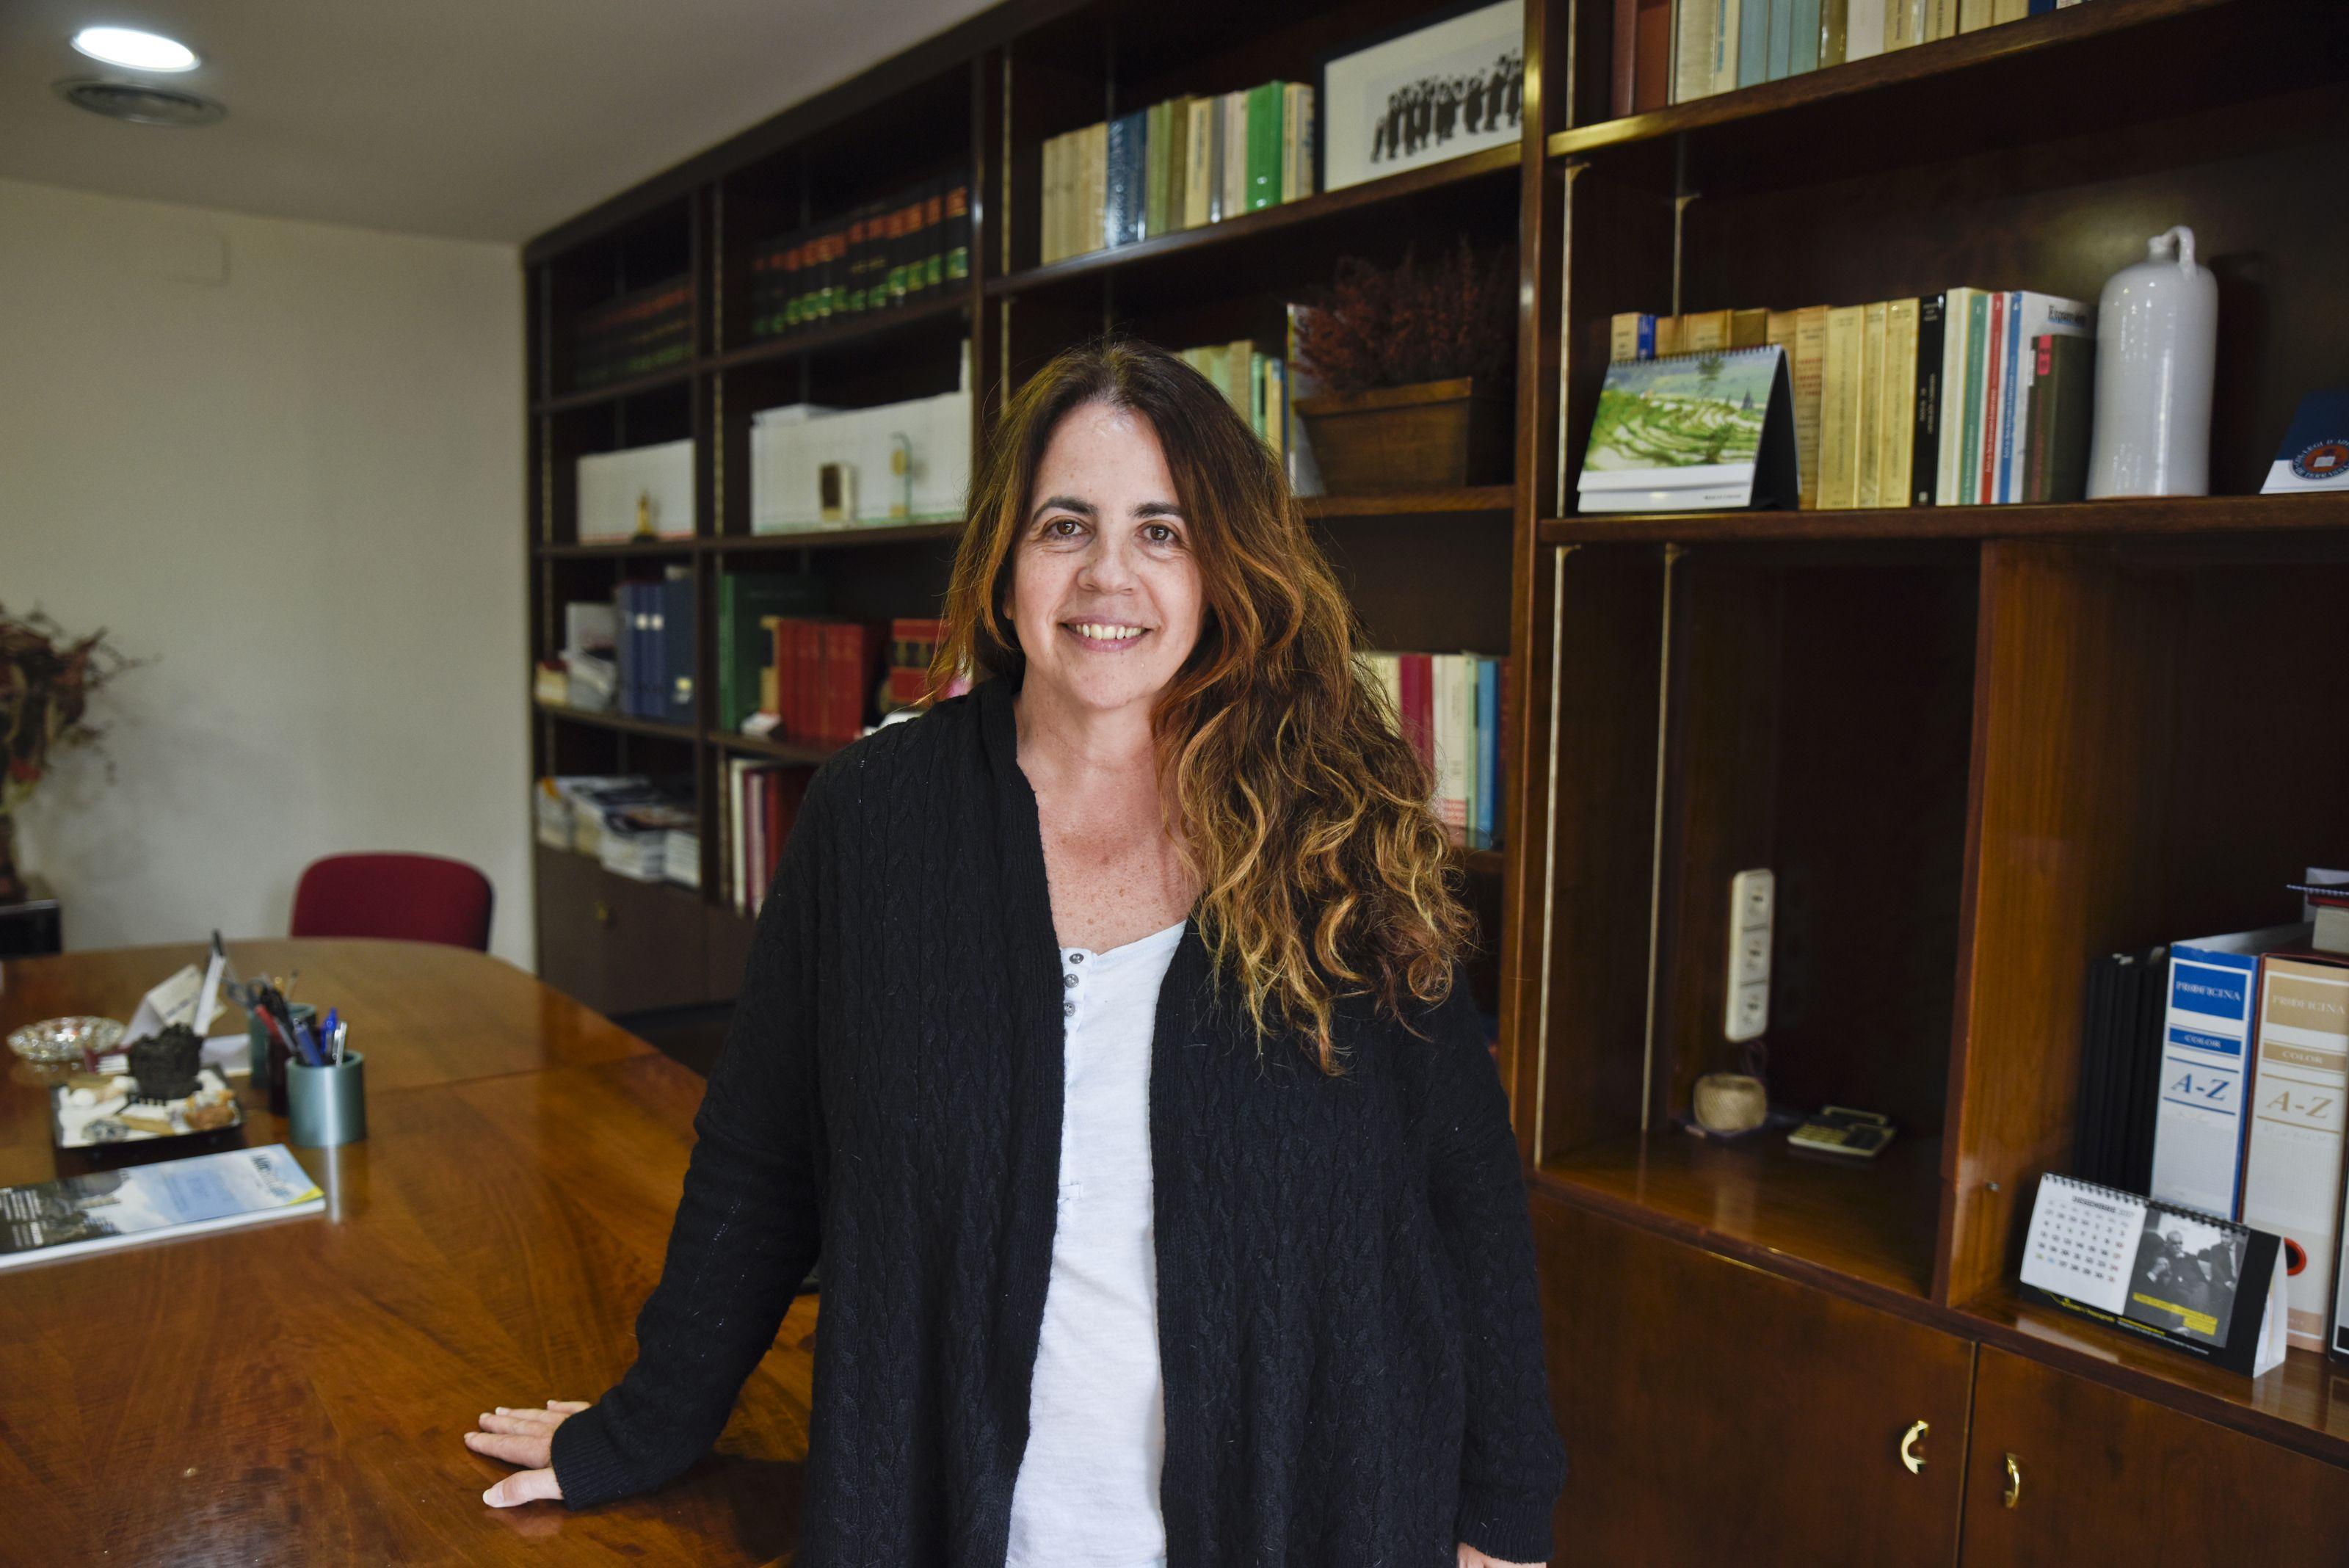 Lourdes Llorente, advocada FOTO: Bernat Millet